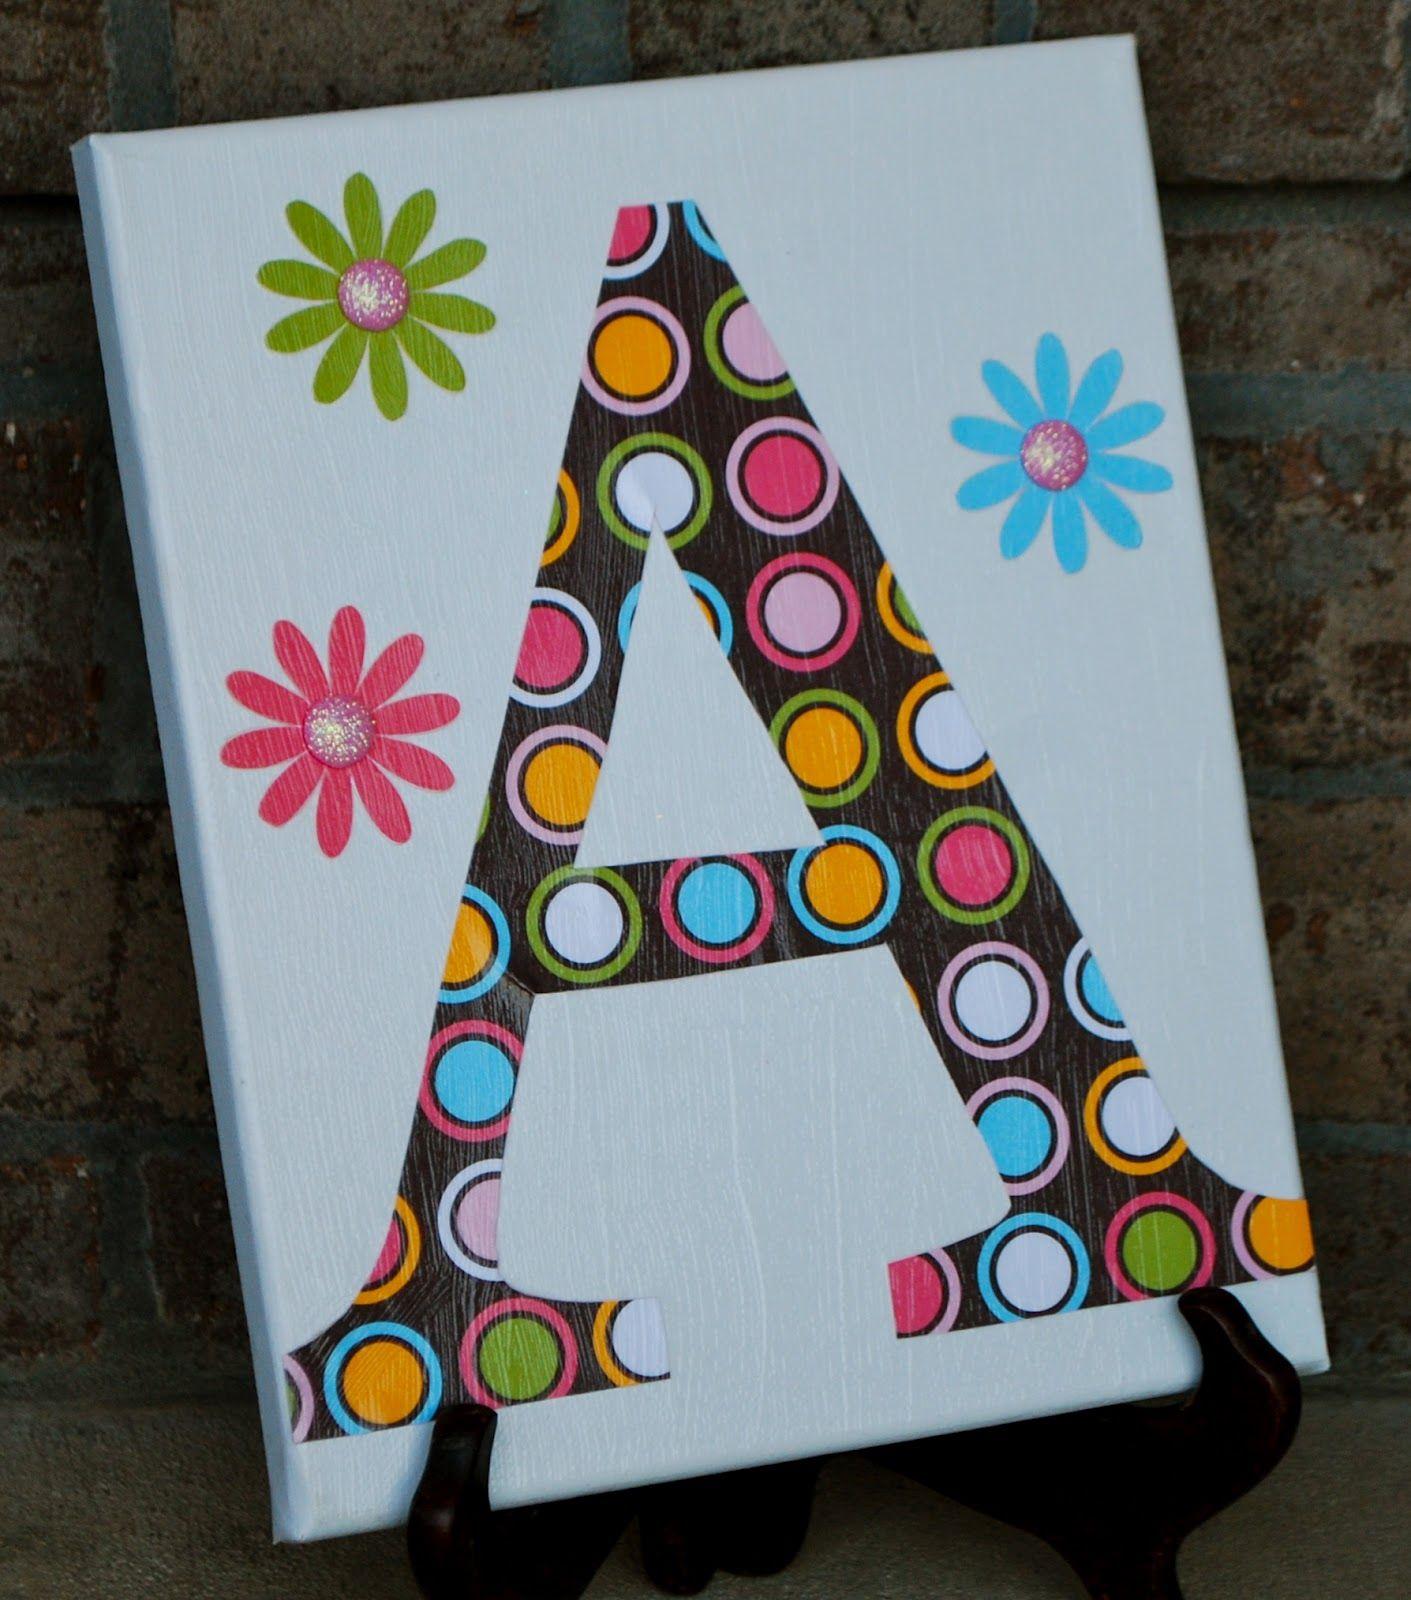 Mod Podge Canvas Projects | Diy monogram, Mod podge crafts ...